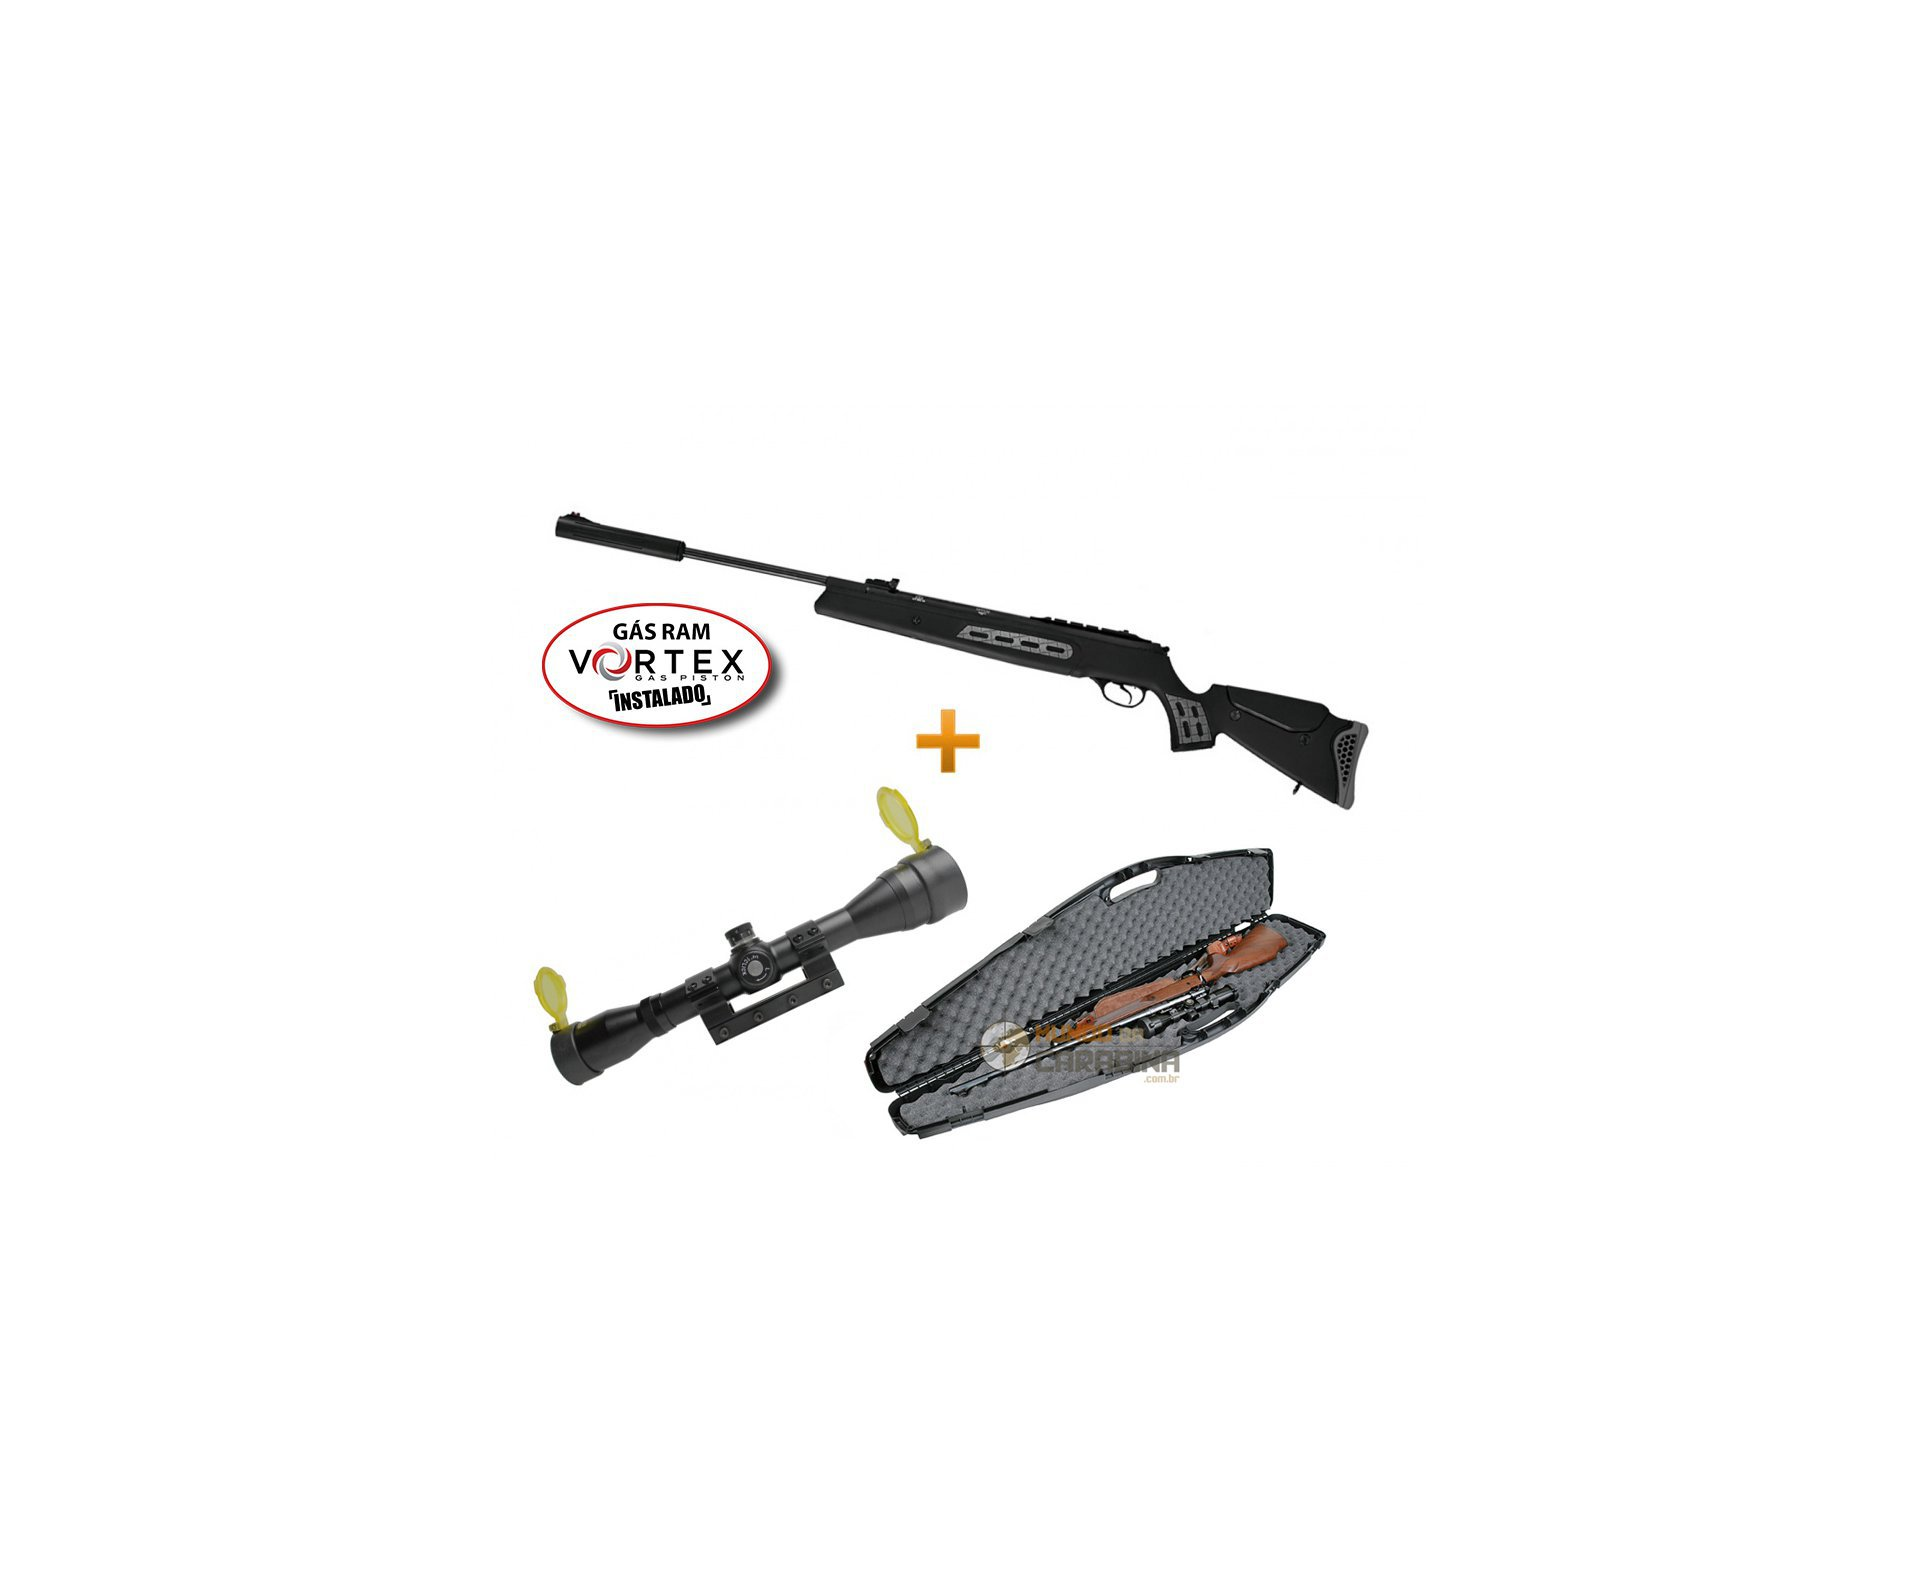 Carabina De Pressão Ht125 Sniper Vortex Gas Ram 75kg + Luneta 4x32 Gold Rossi + Case Rigido - Hatsan